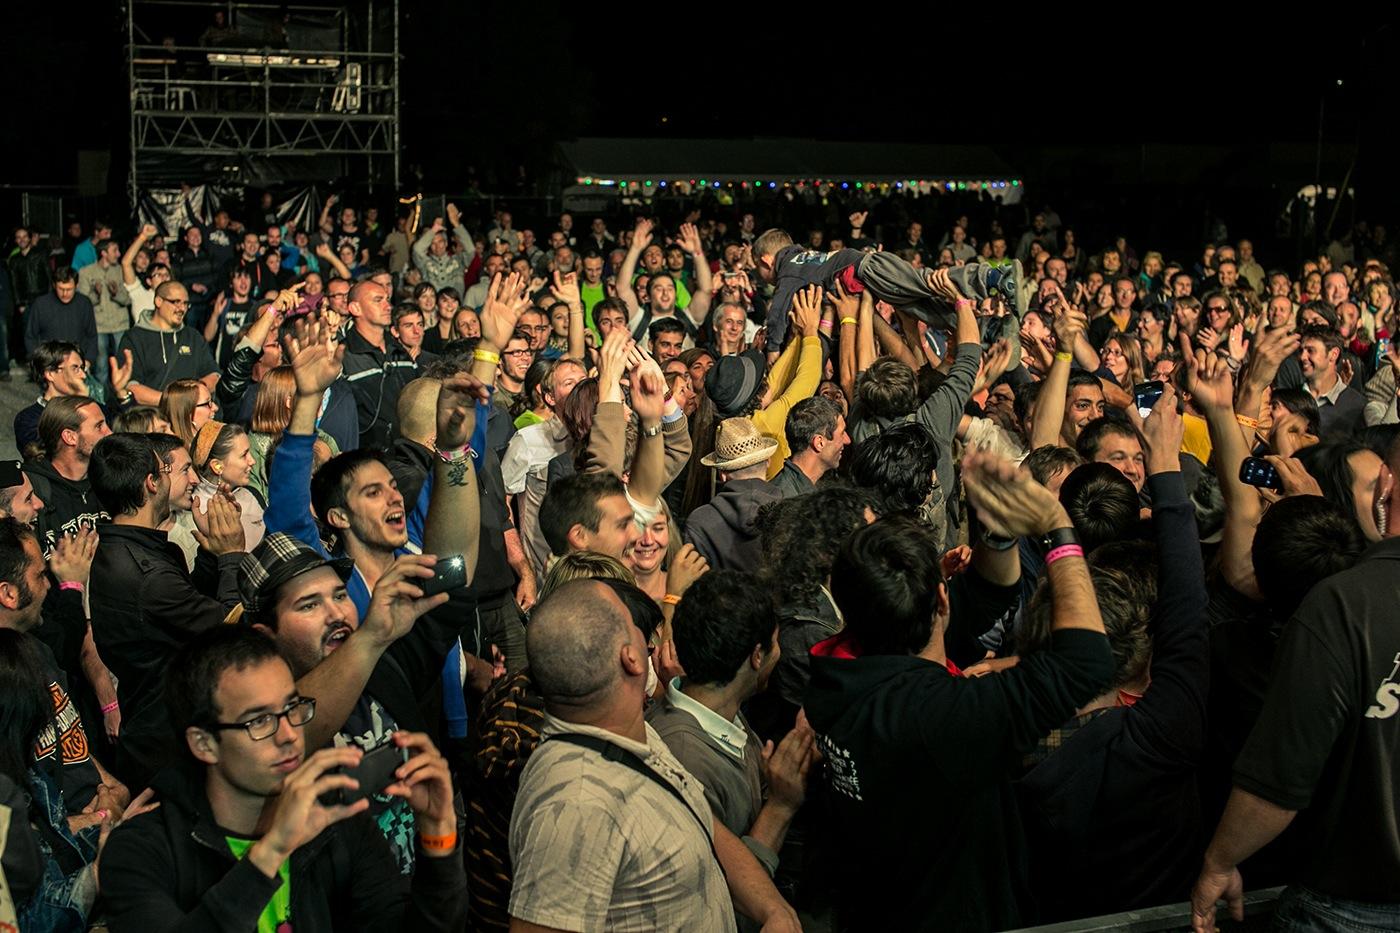 photographe-reportage-festival-rockadel-guillaume-heraud-002-small